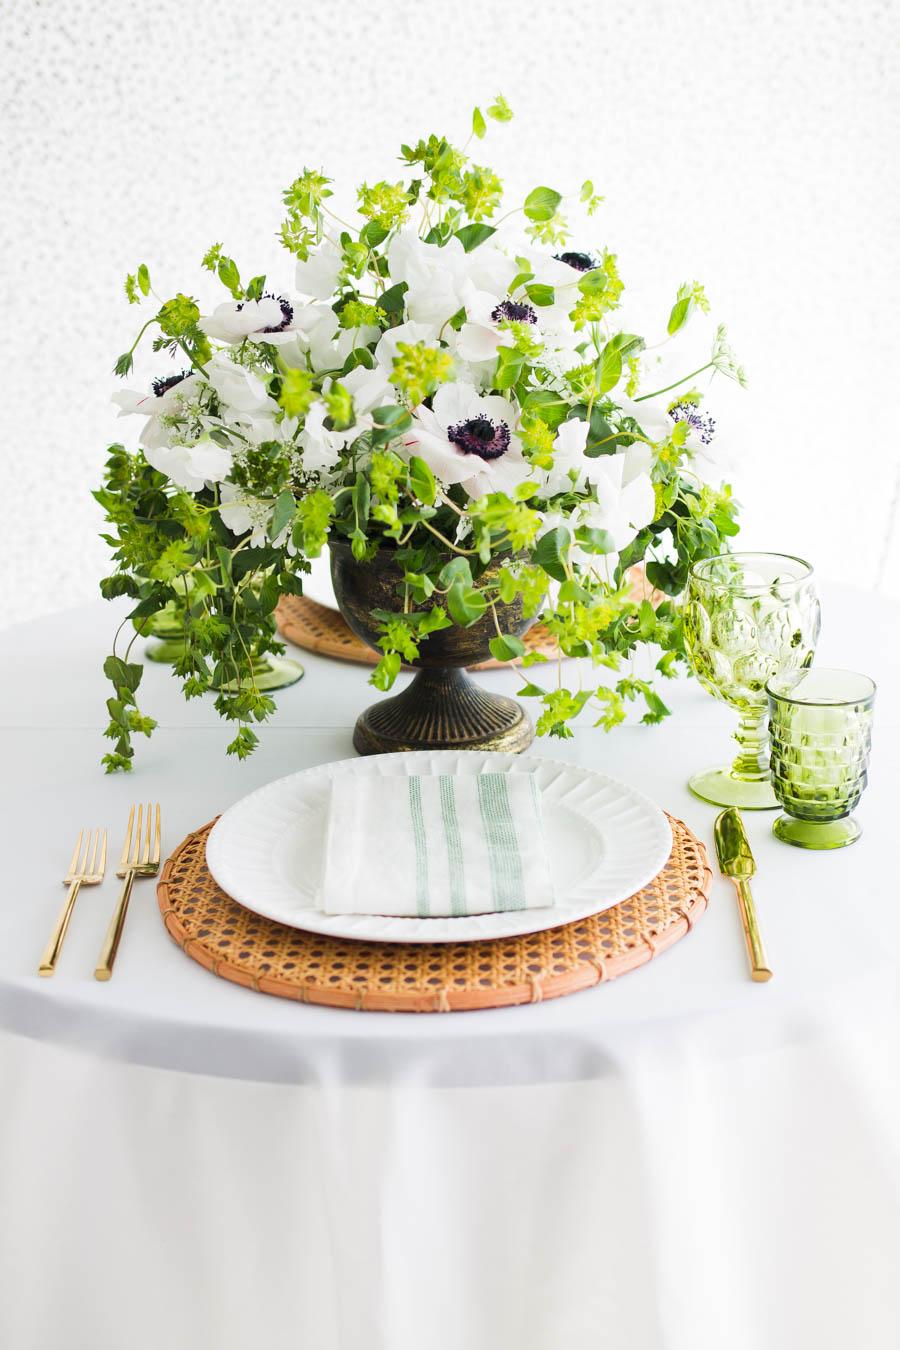 St. Patrick's Day Tablescape Inspiration